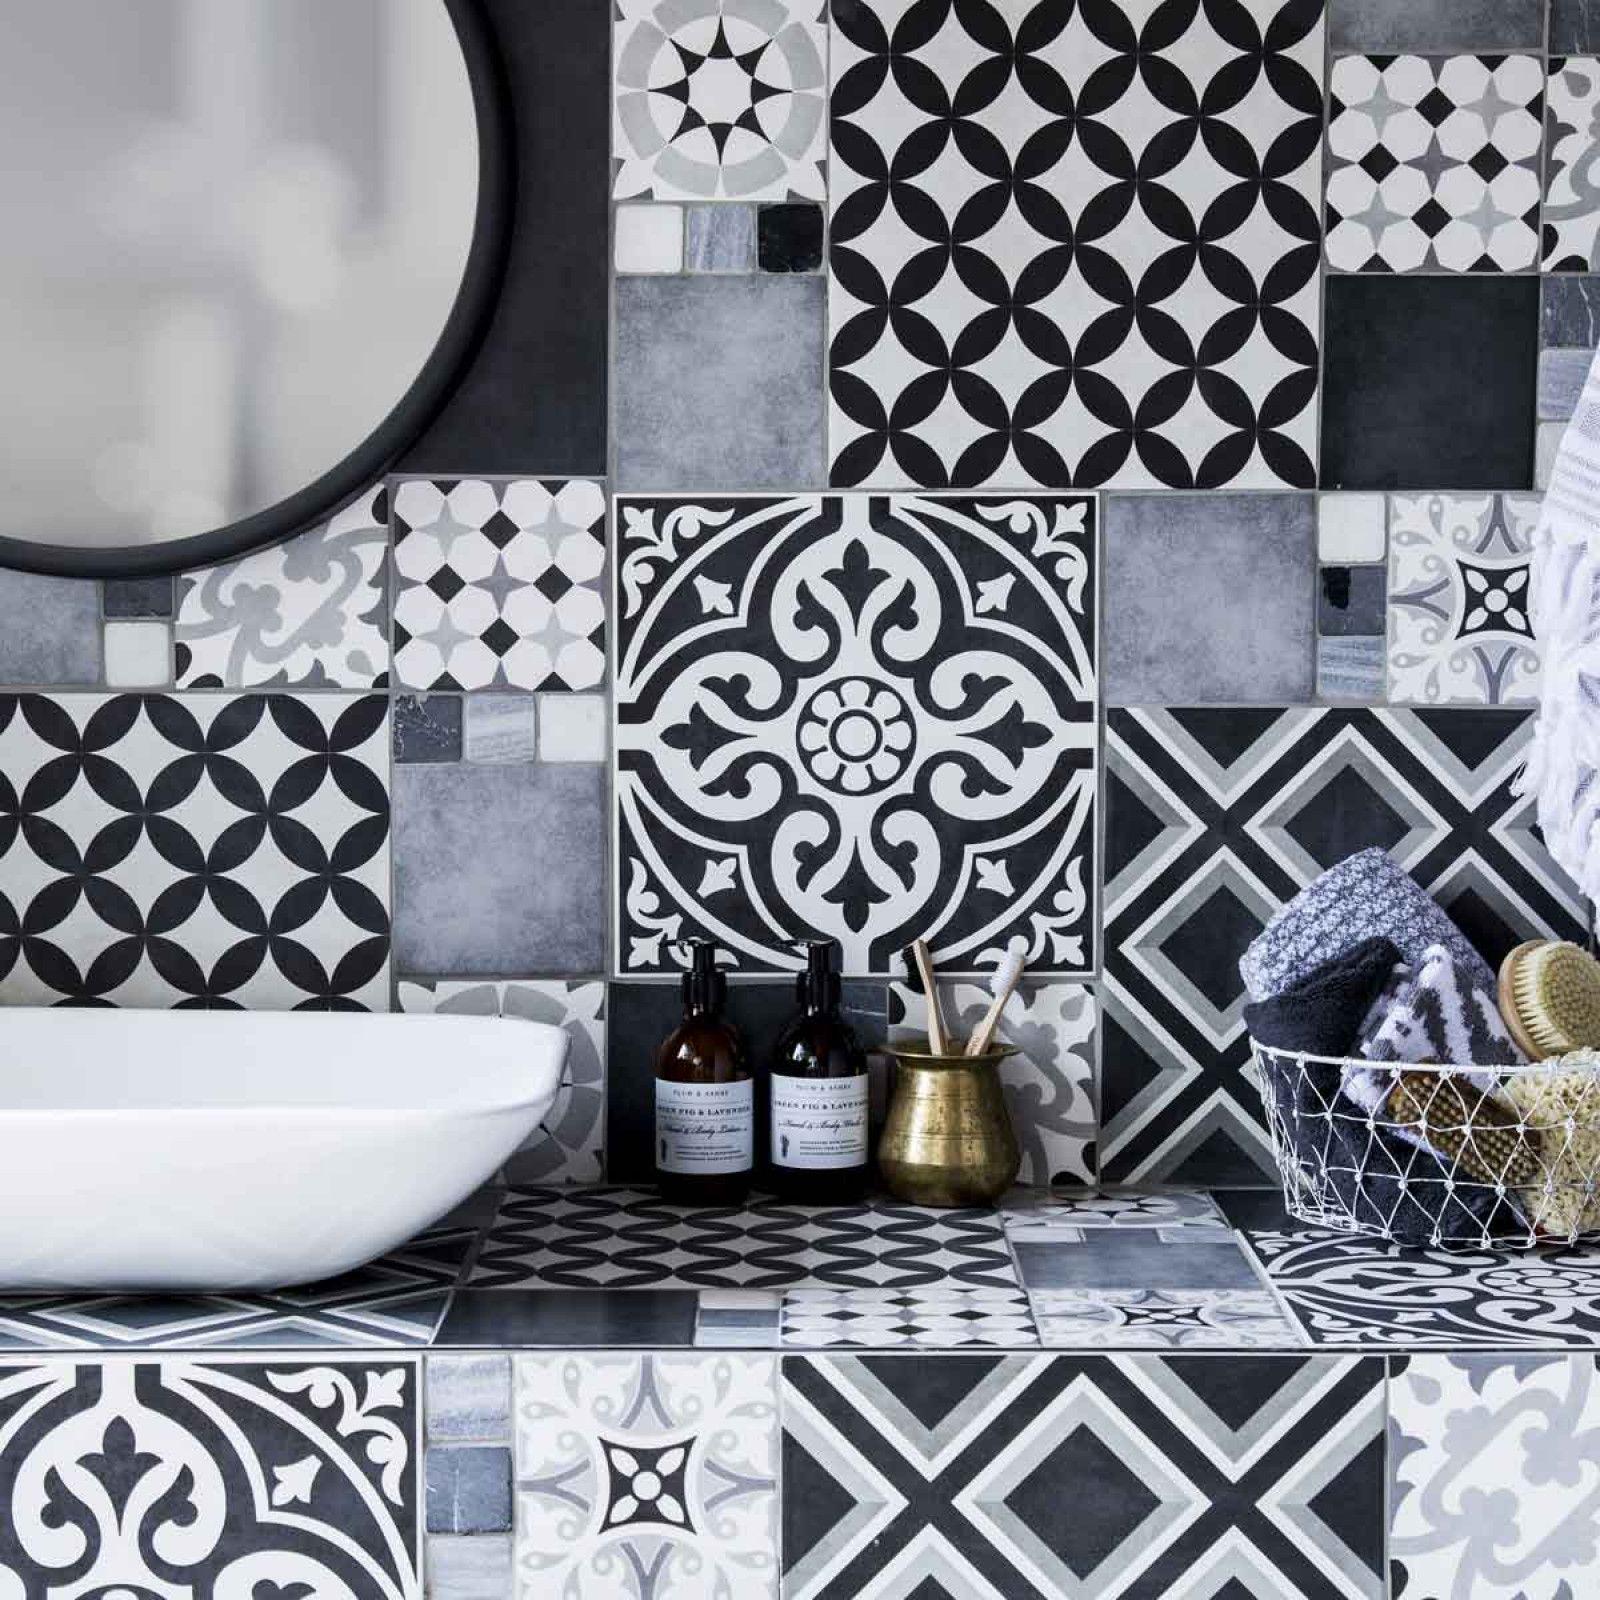 Feature floors bertie black white matt wall floor british feature floors bertie black white matt wall floor british ceramic tile dailygadgetfo Image collections